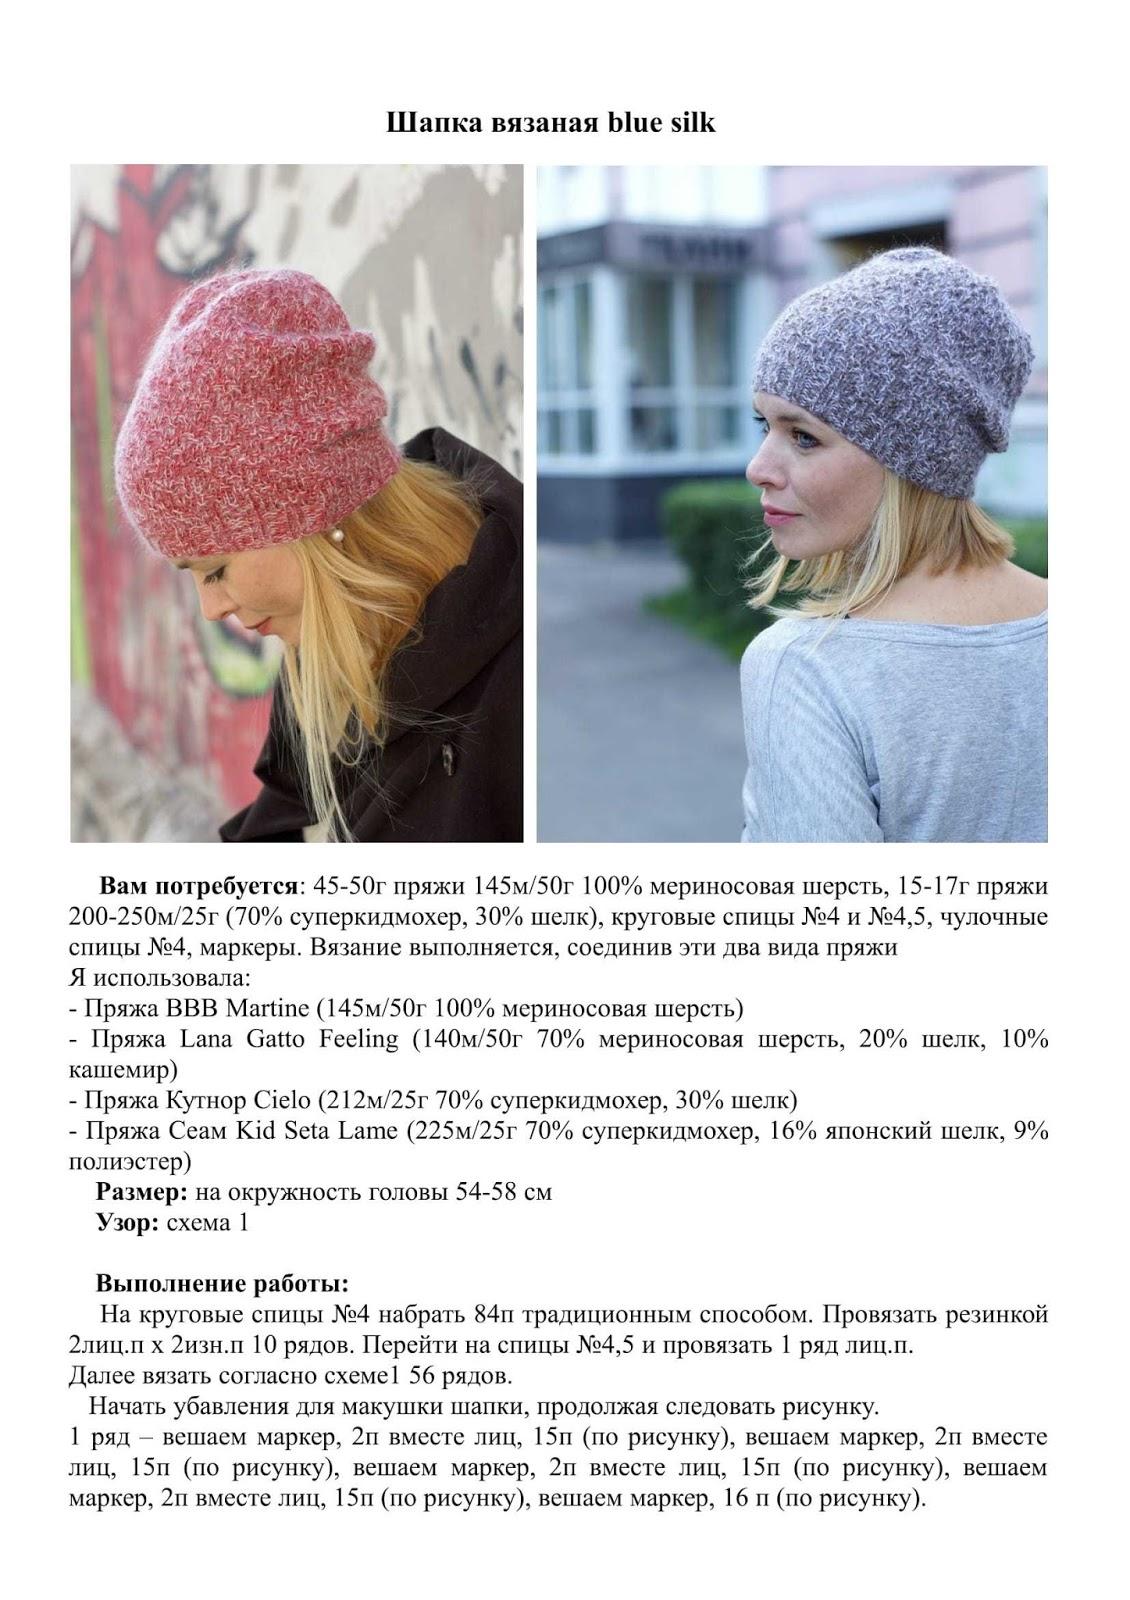 Вязаные шапки 2017-2018 со схемами спицами: шаг1